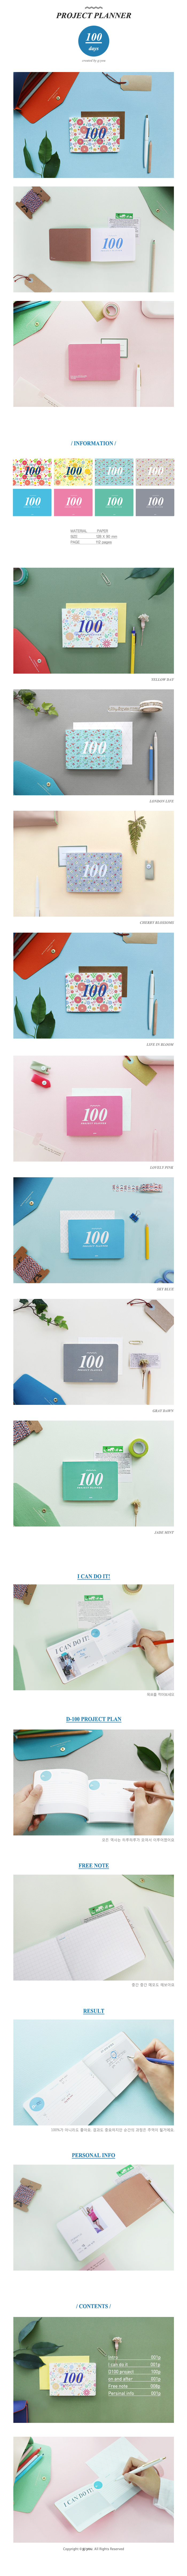 D100 Project Planner1,050원-지유디자인문구, 플래너/스케줄러, 플래너, 100일플래너바보사랑D100 Project Planner1,050원-지유디자인문구, 플래너/스케줄러, 플래너, 100일플래너바보사랑